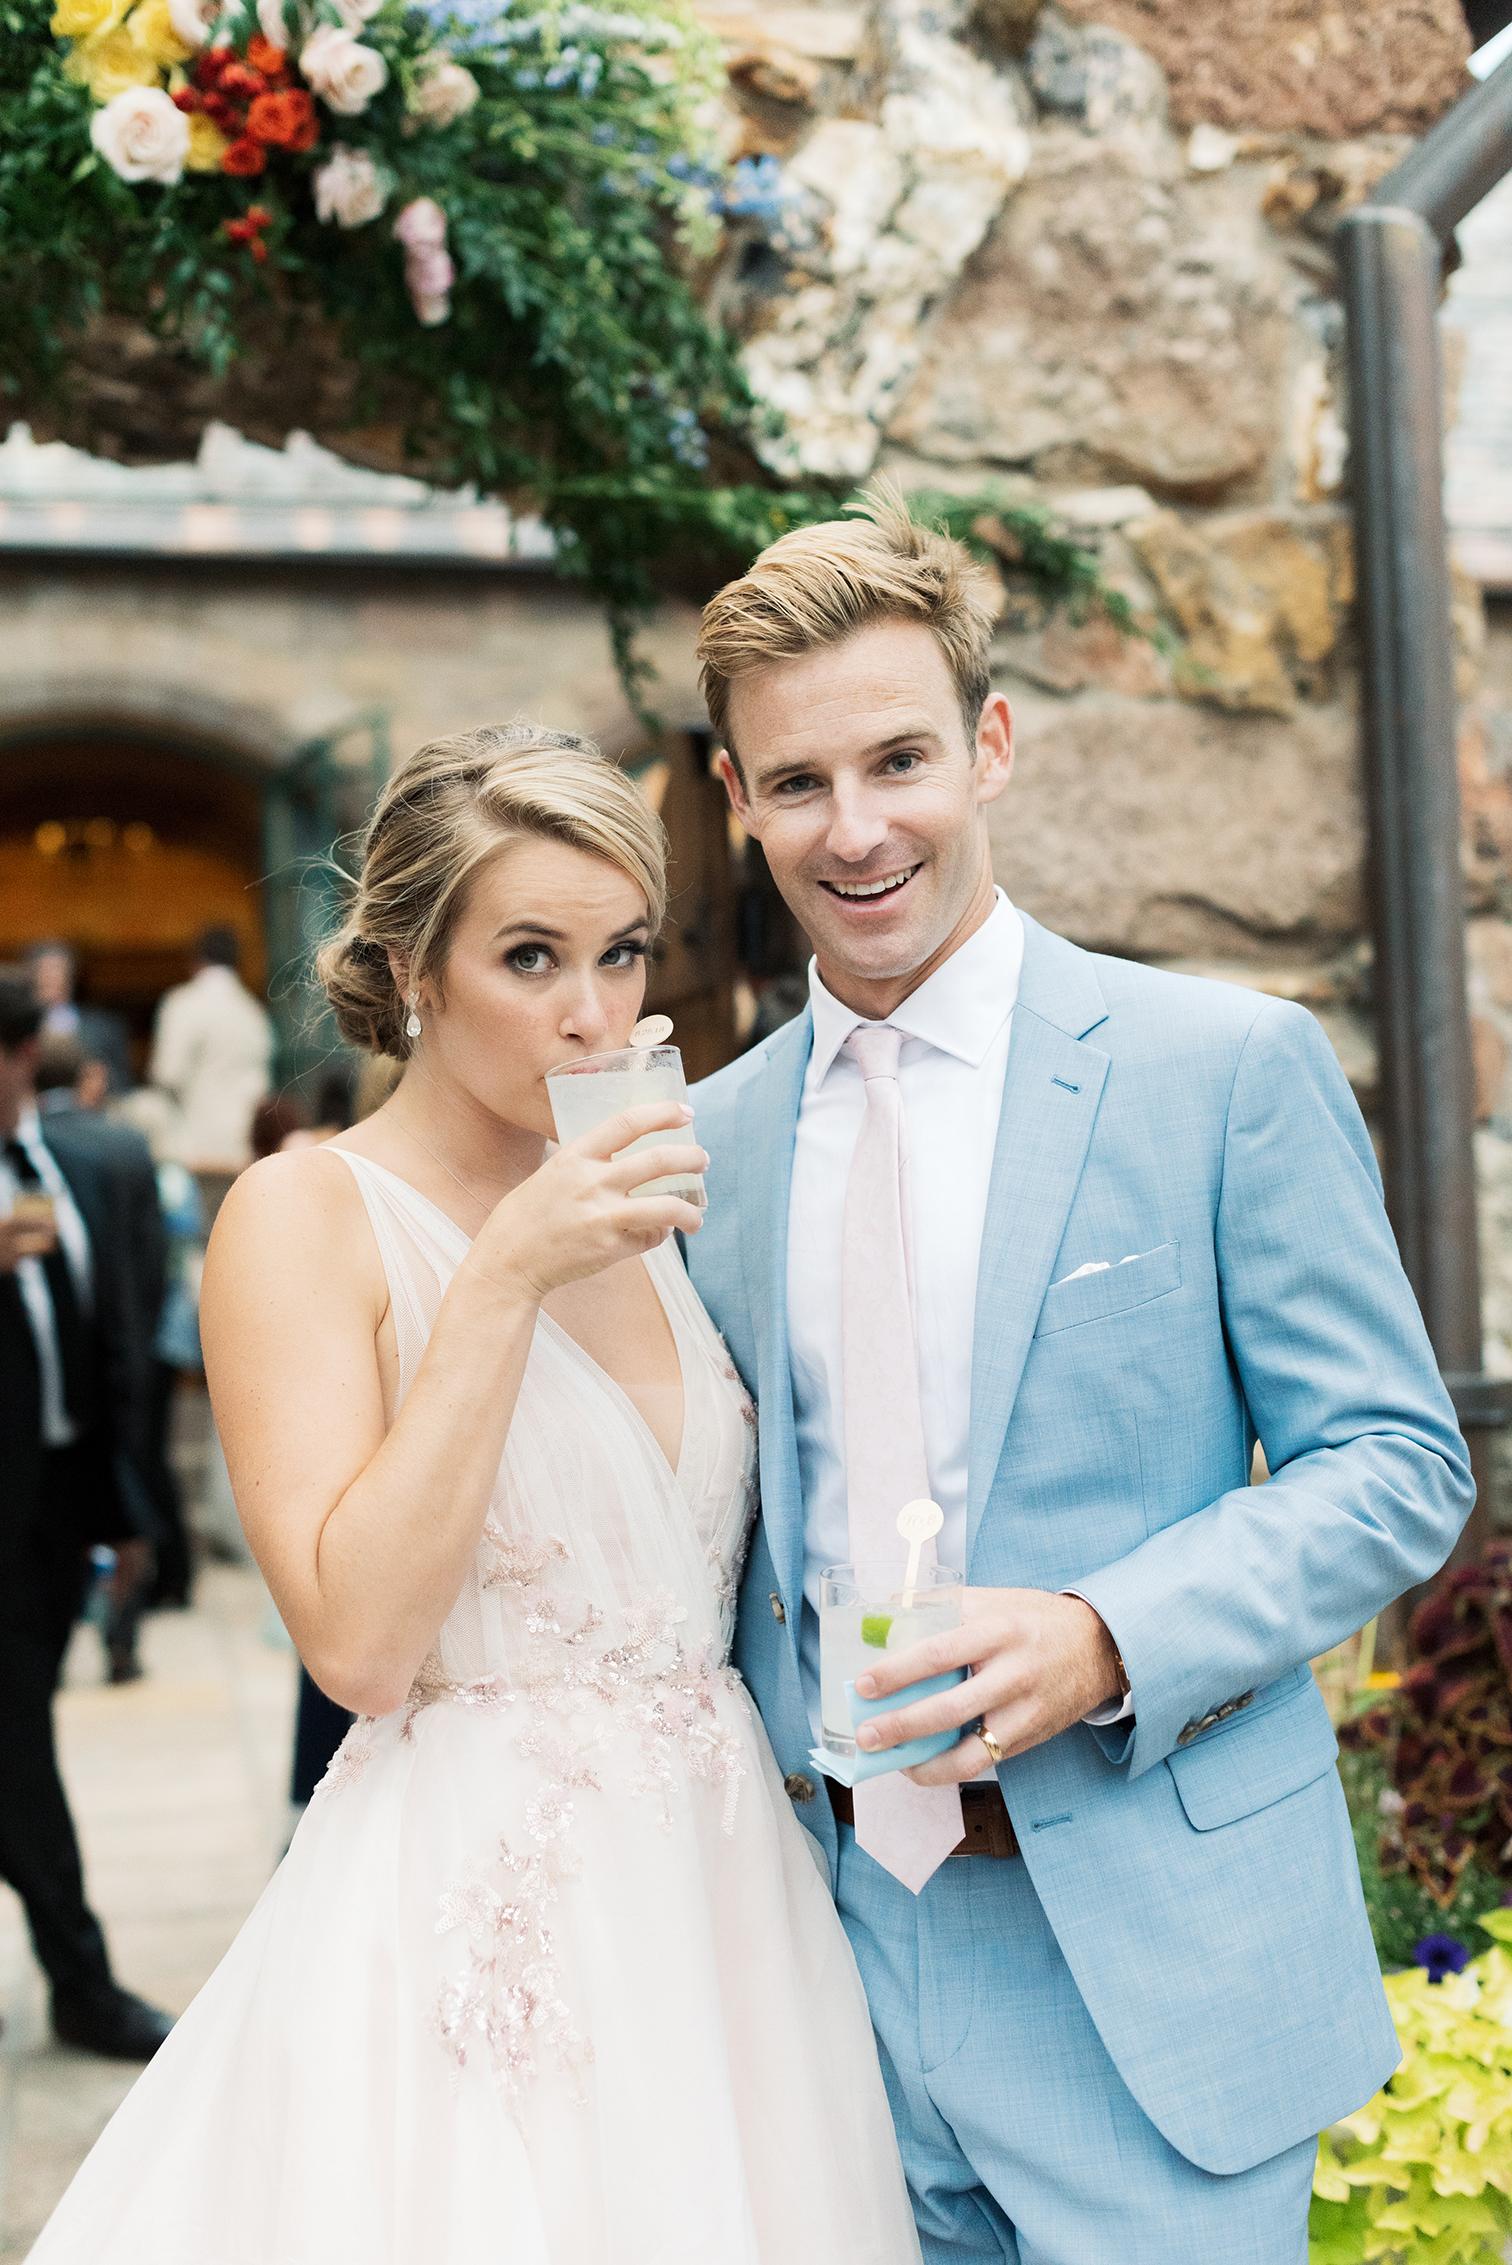 Wedding Photographers Colorado, Best Signature Cocktails, Desintation Weddings in Colorado, Denver Wedding Photos